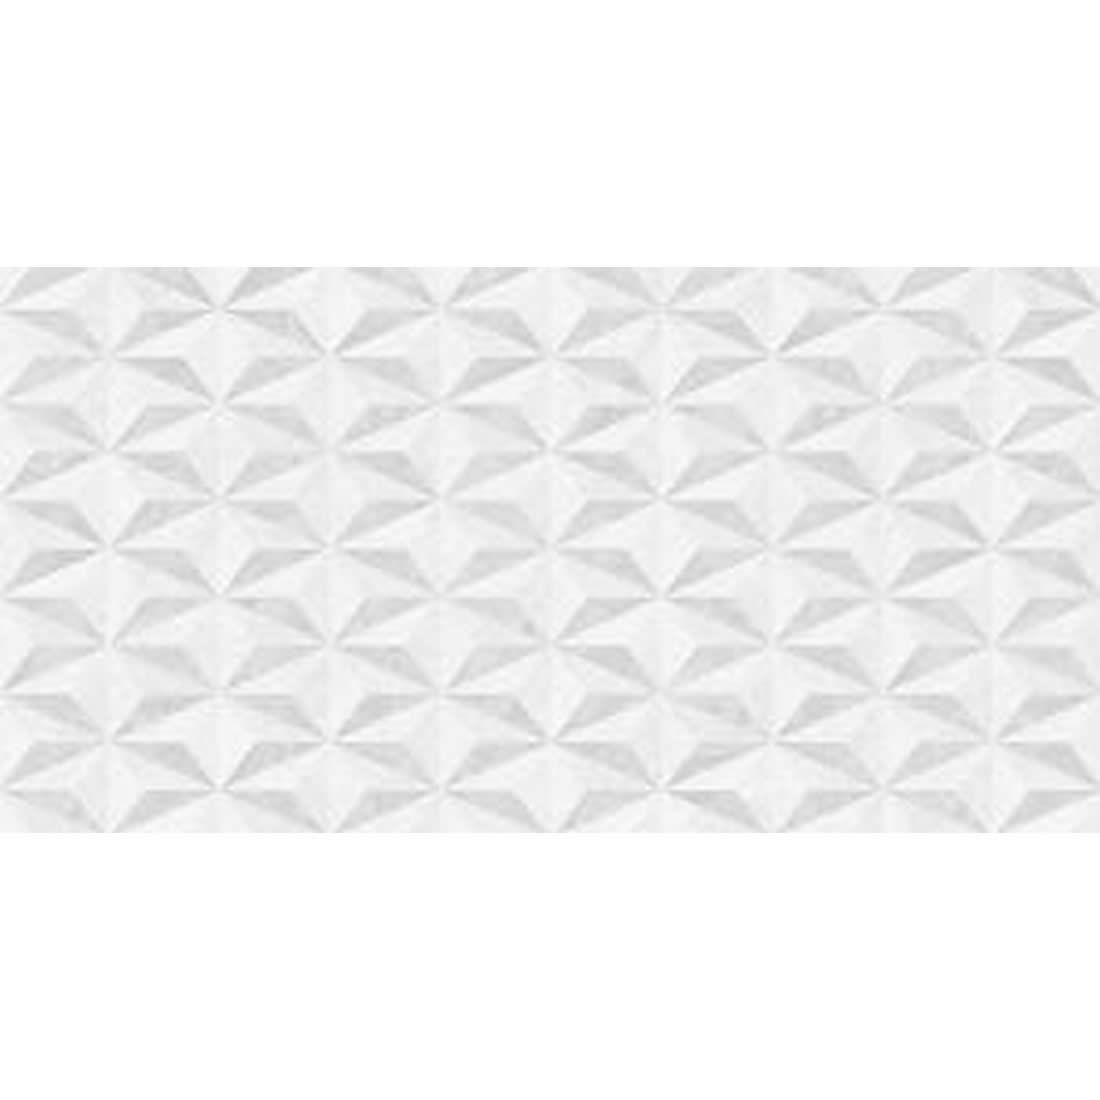 Revestimento Tecnogres 29 x 58 Piramide Gray Brilhante Ref RV-58440R